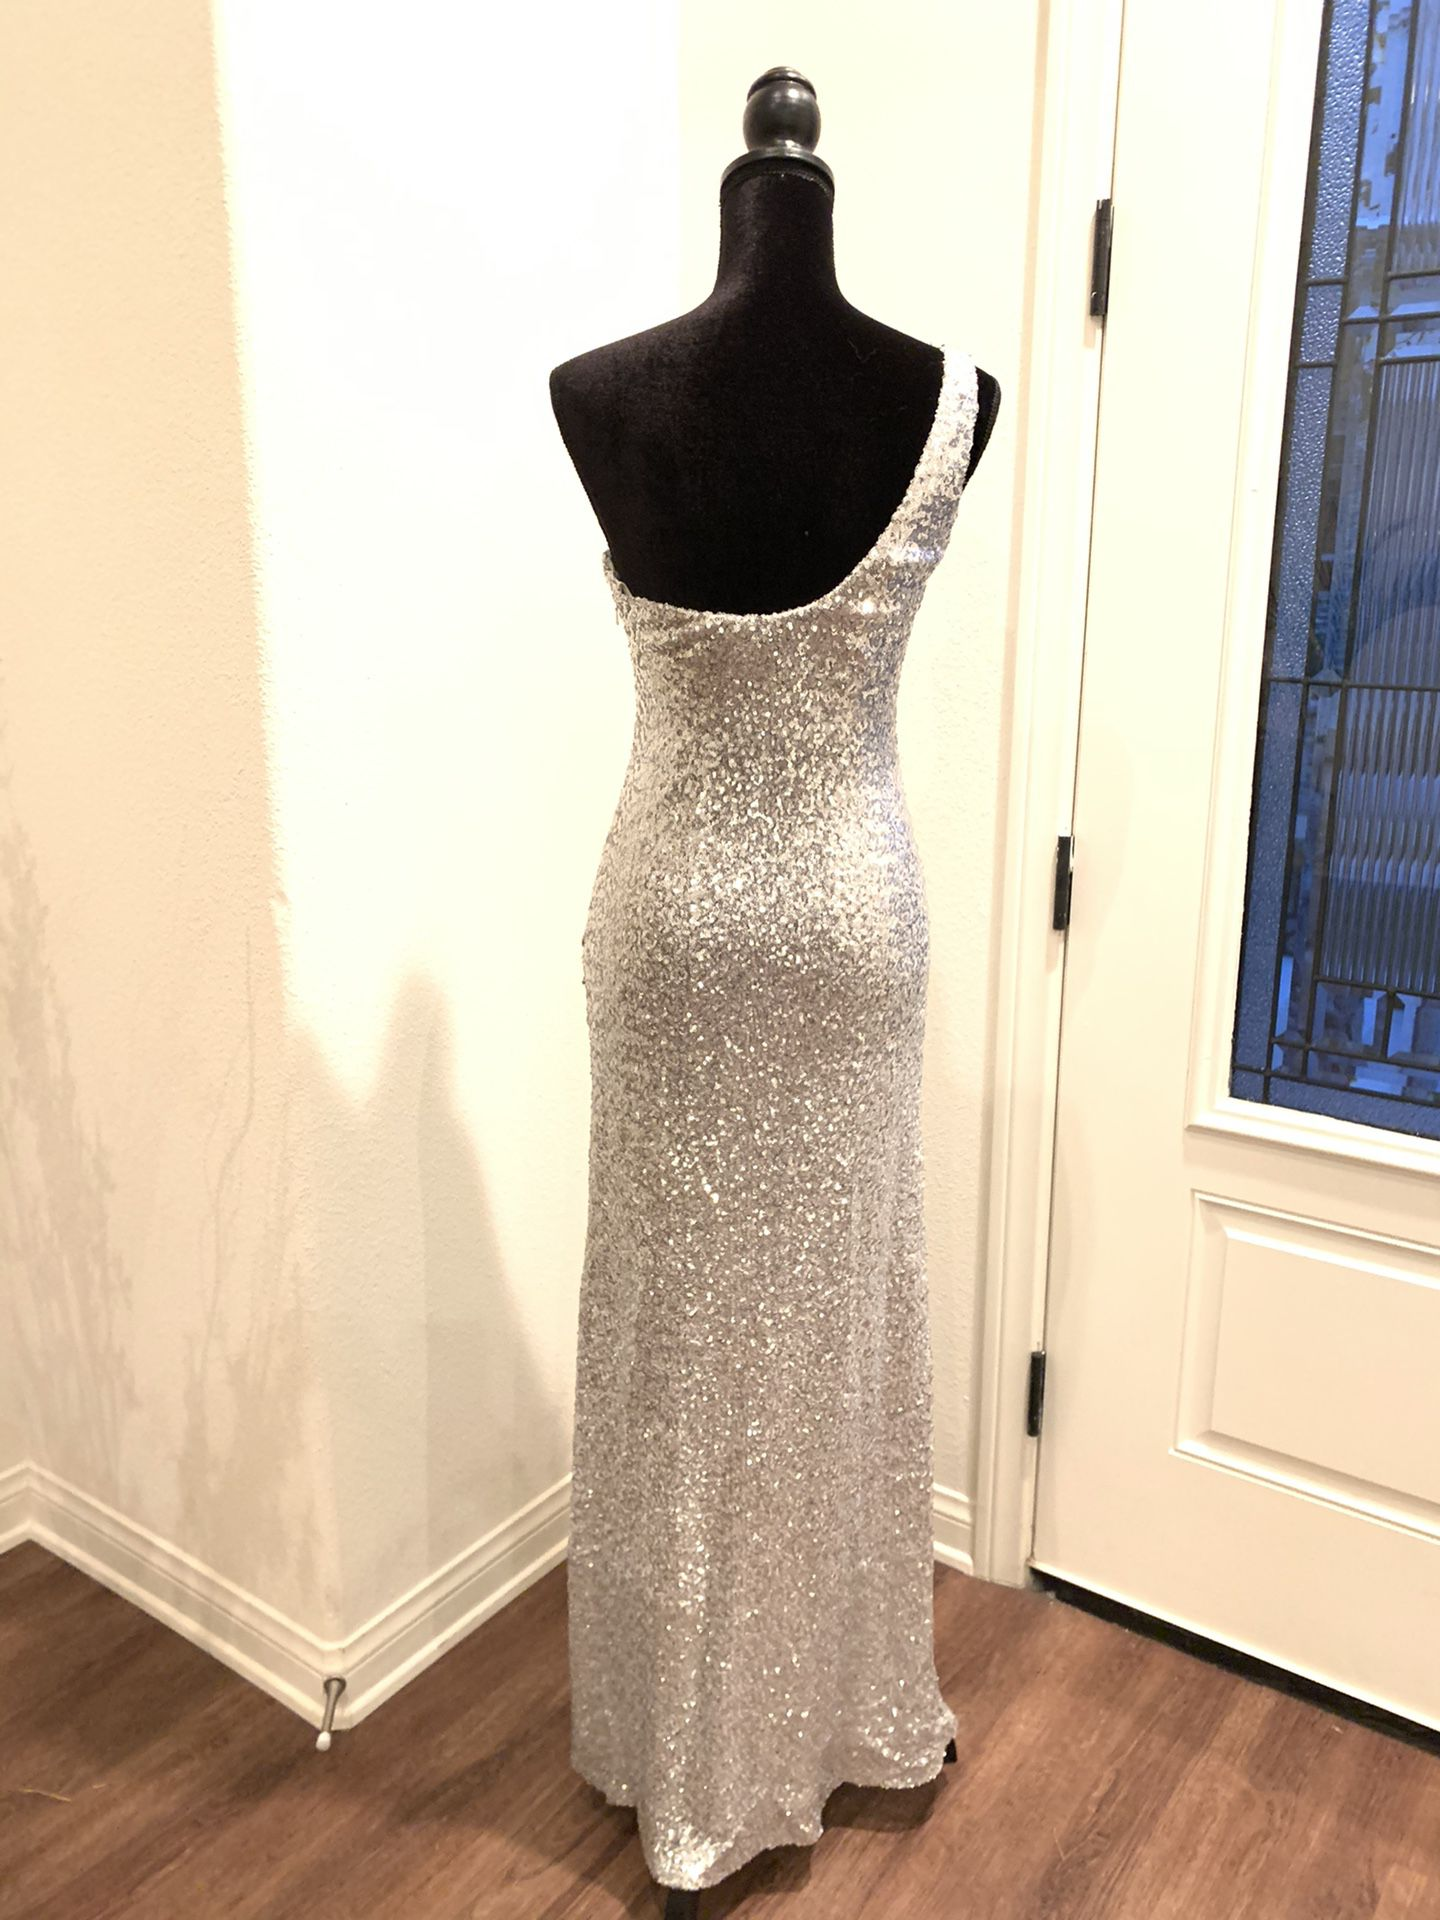 La Femme Maxi, One Shoulder, Silver and Teal Dress